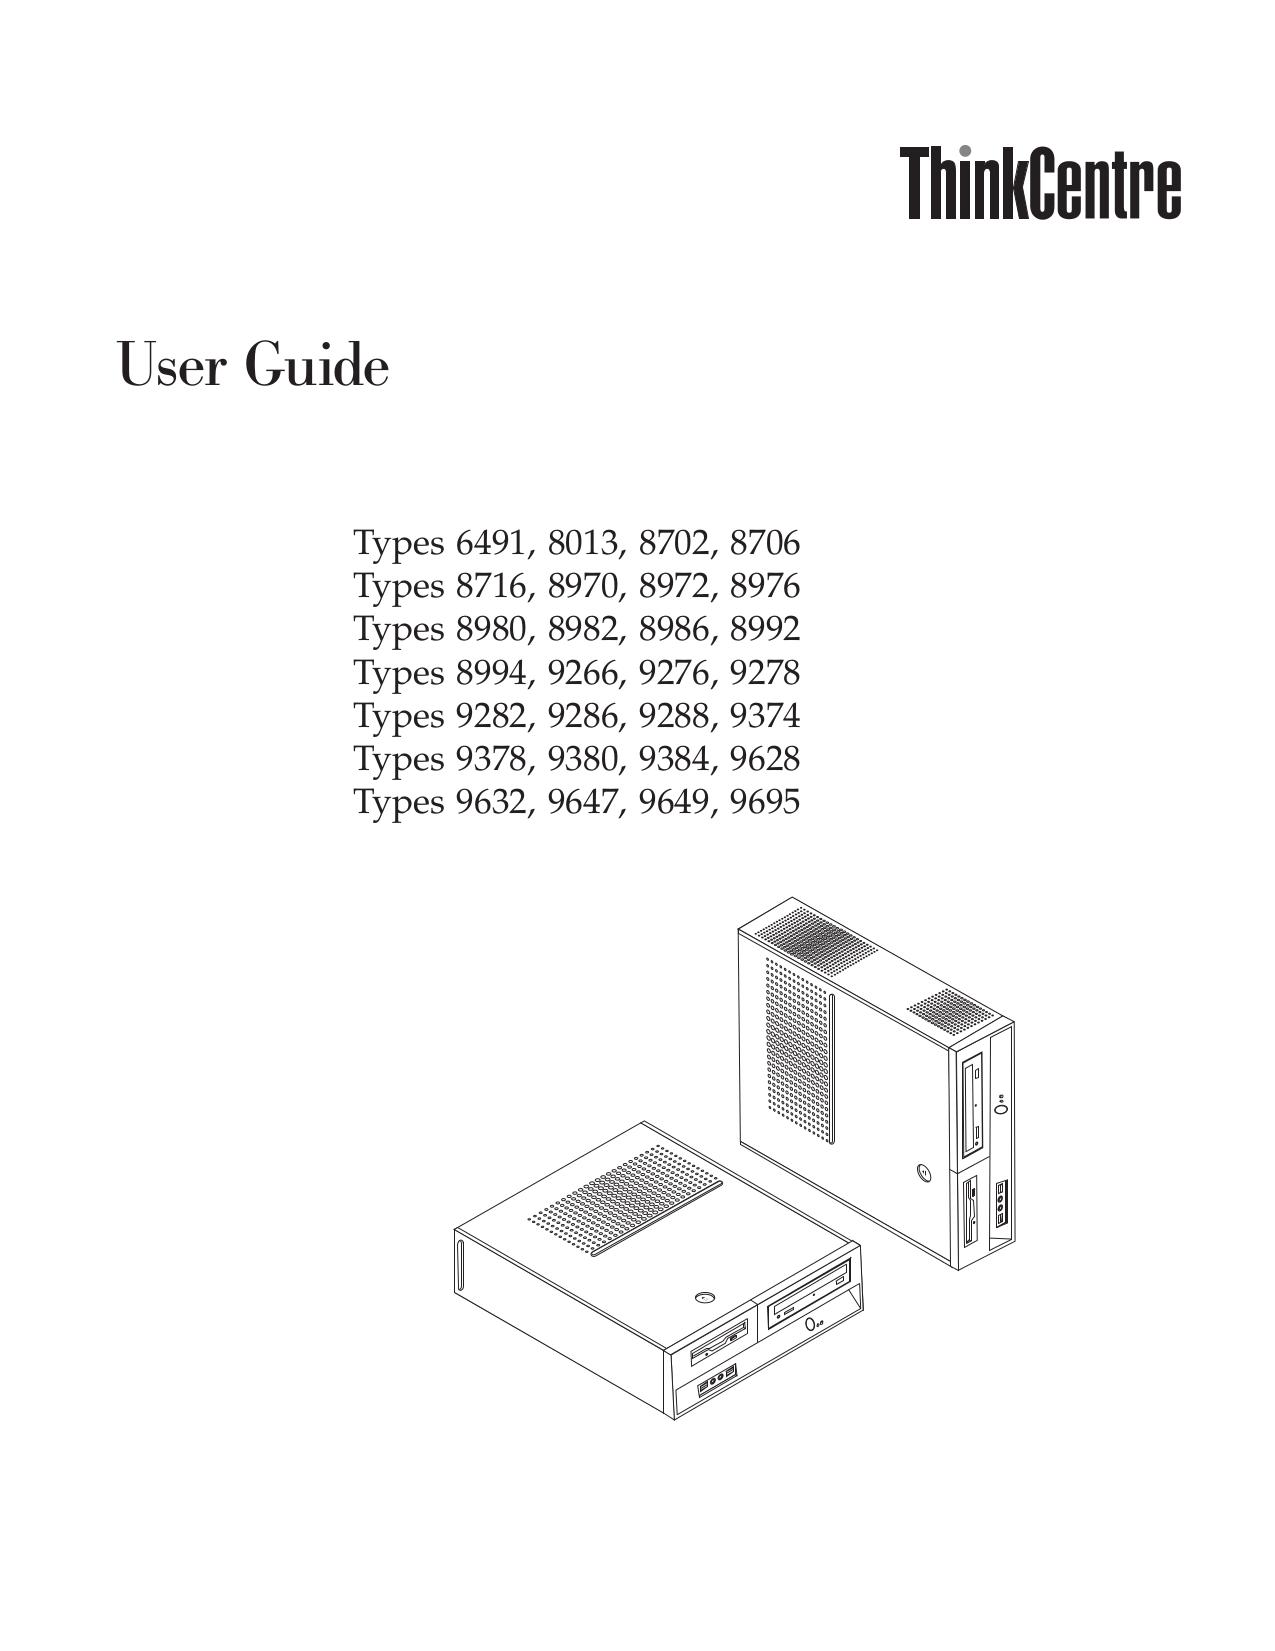 pdf for Lenovo Desktop ThinkCentre M55e 6491 manual